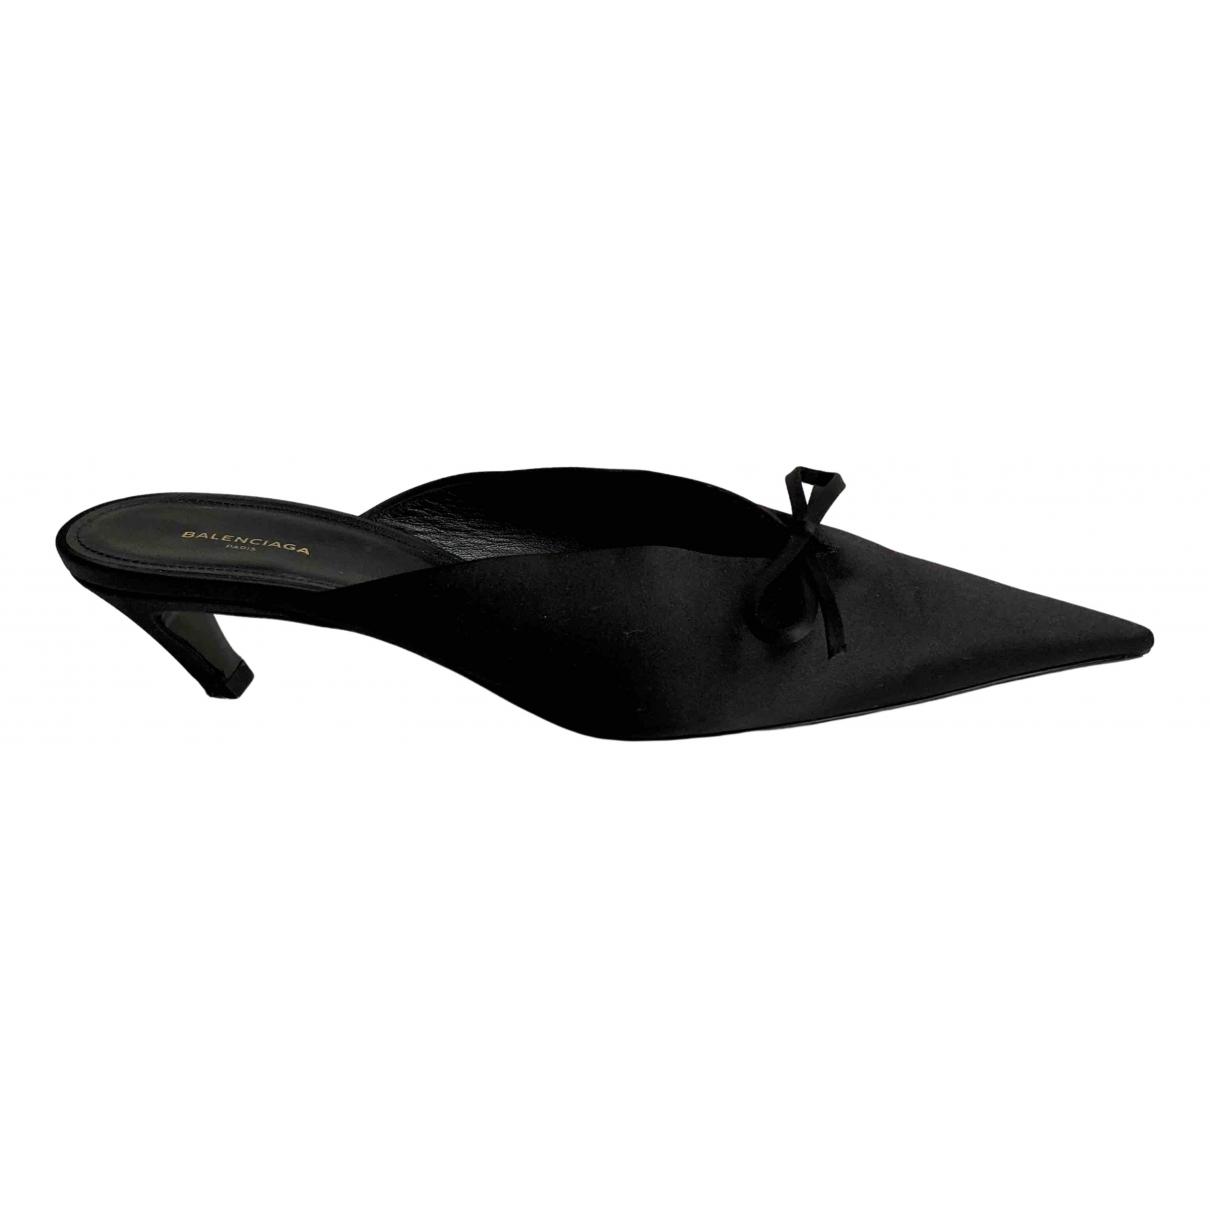 Balenciaga Knife Black Cloth Sandals for Women 39 EU